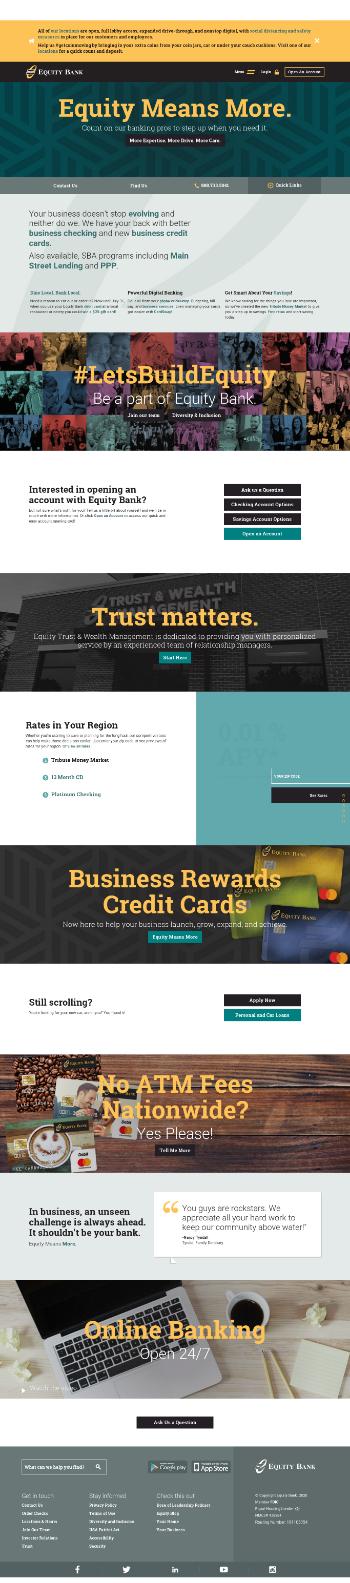 Equity Bancshares, Inc. Website Screenshot